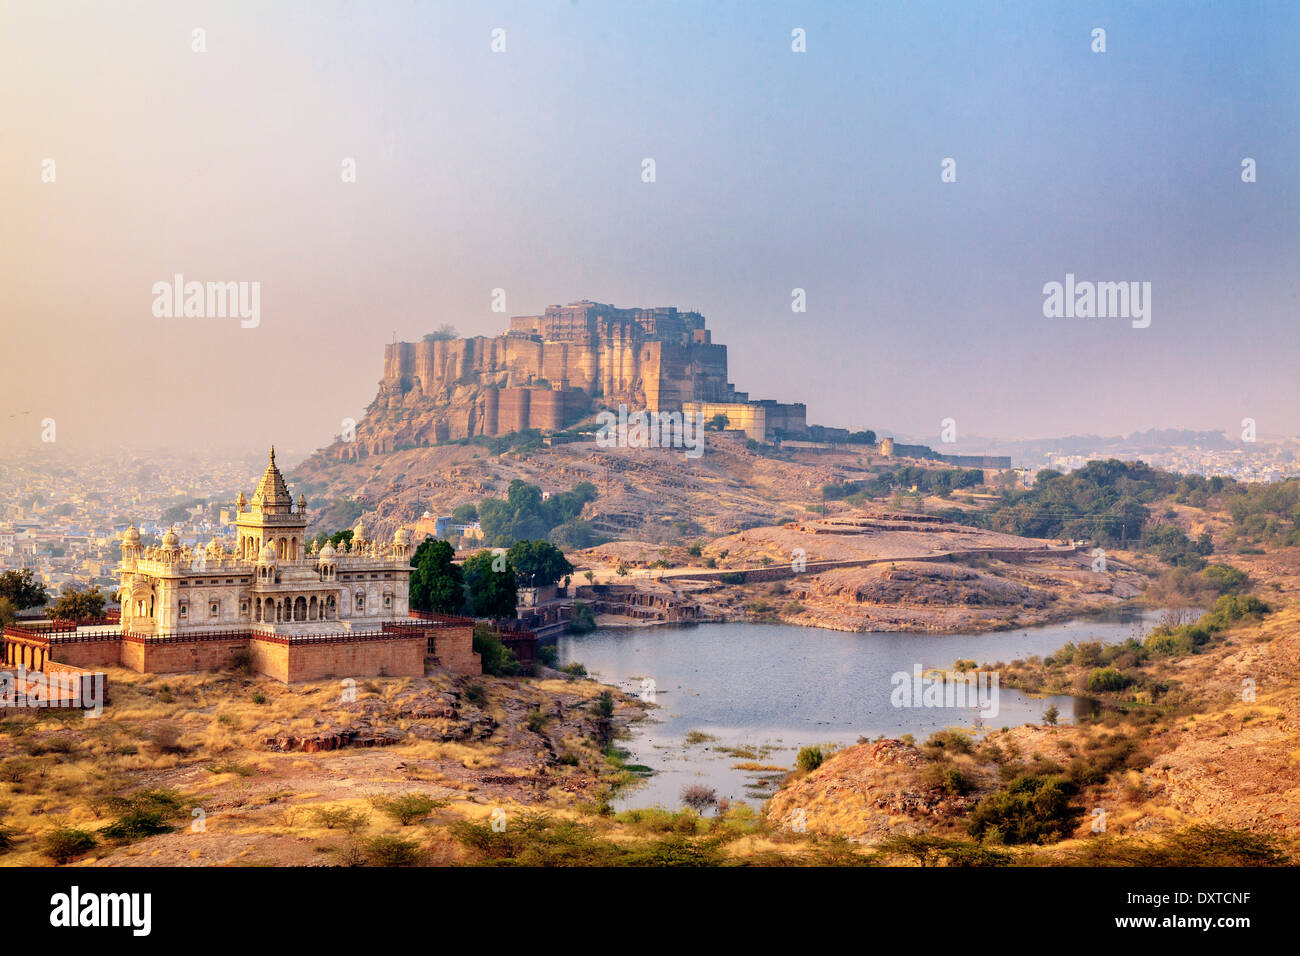 India, Rajasthan, Jodhpur, Jaswant Thada Temple and Mehrangarh Fort - Stock Image